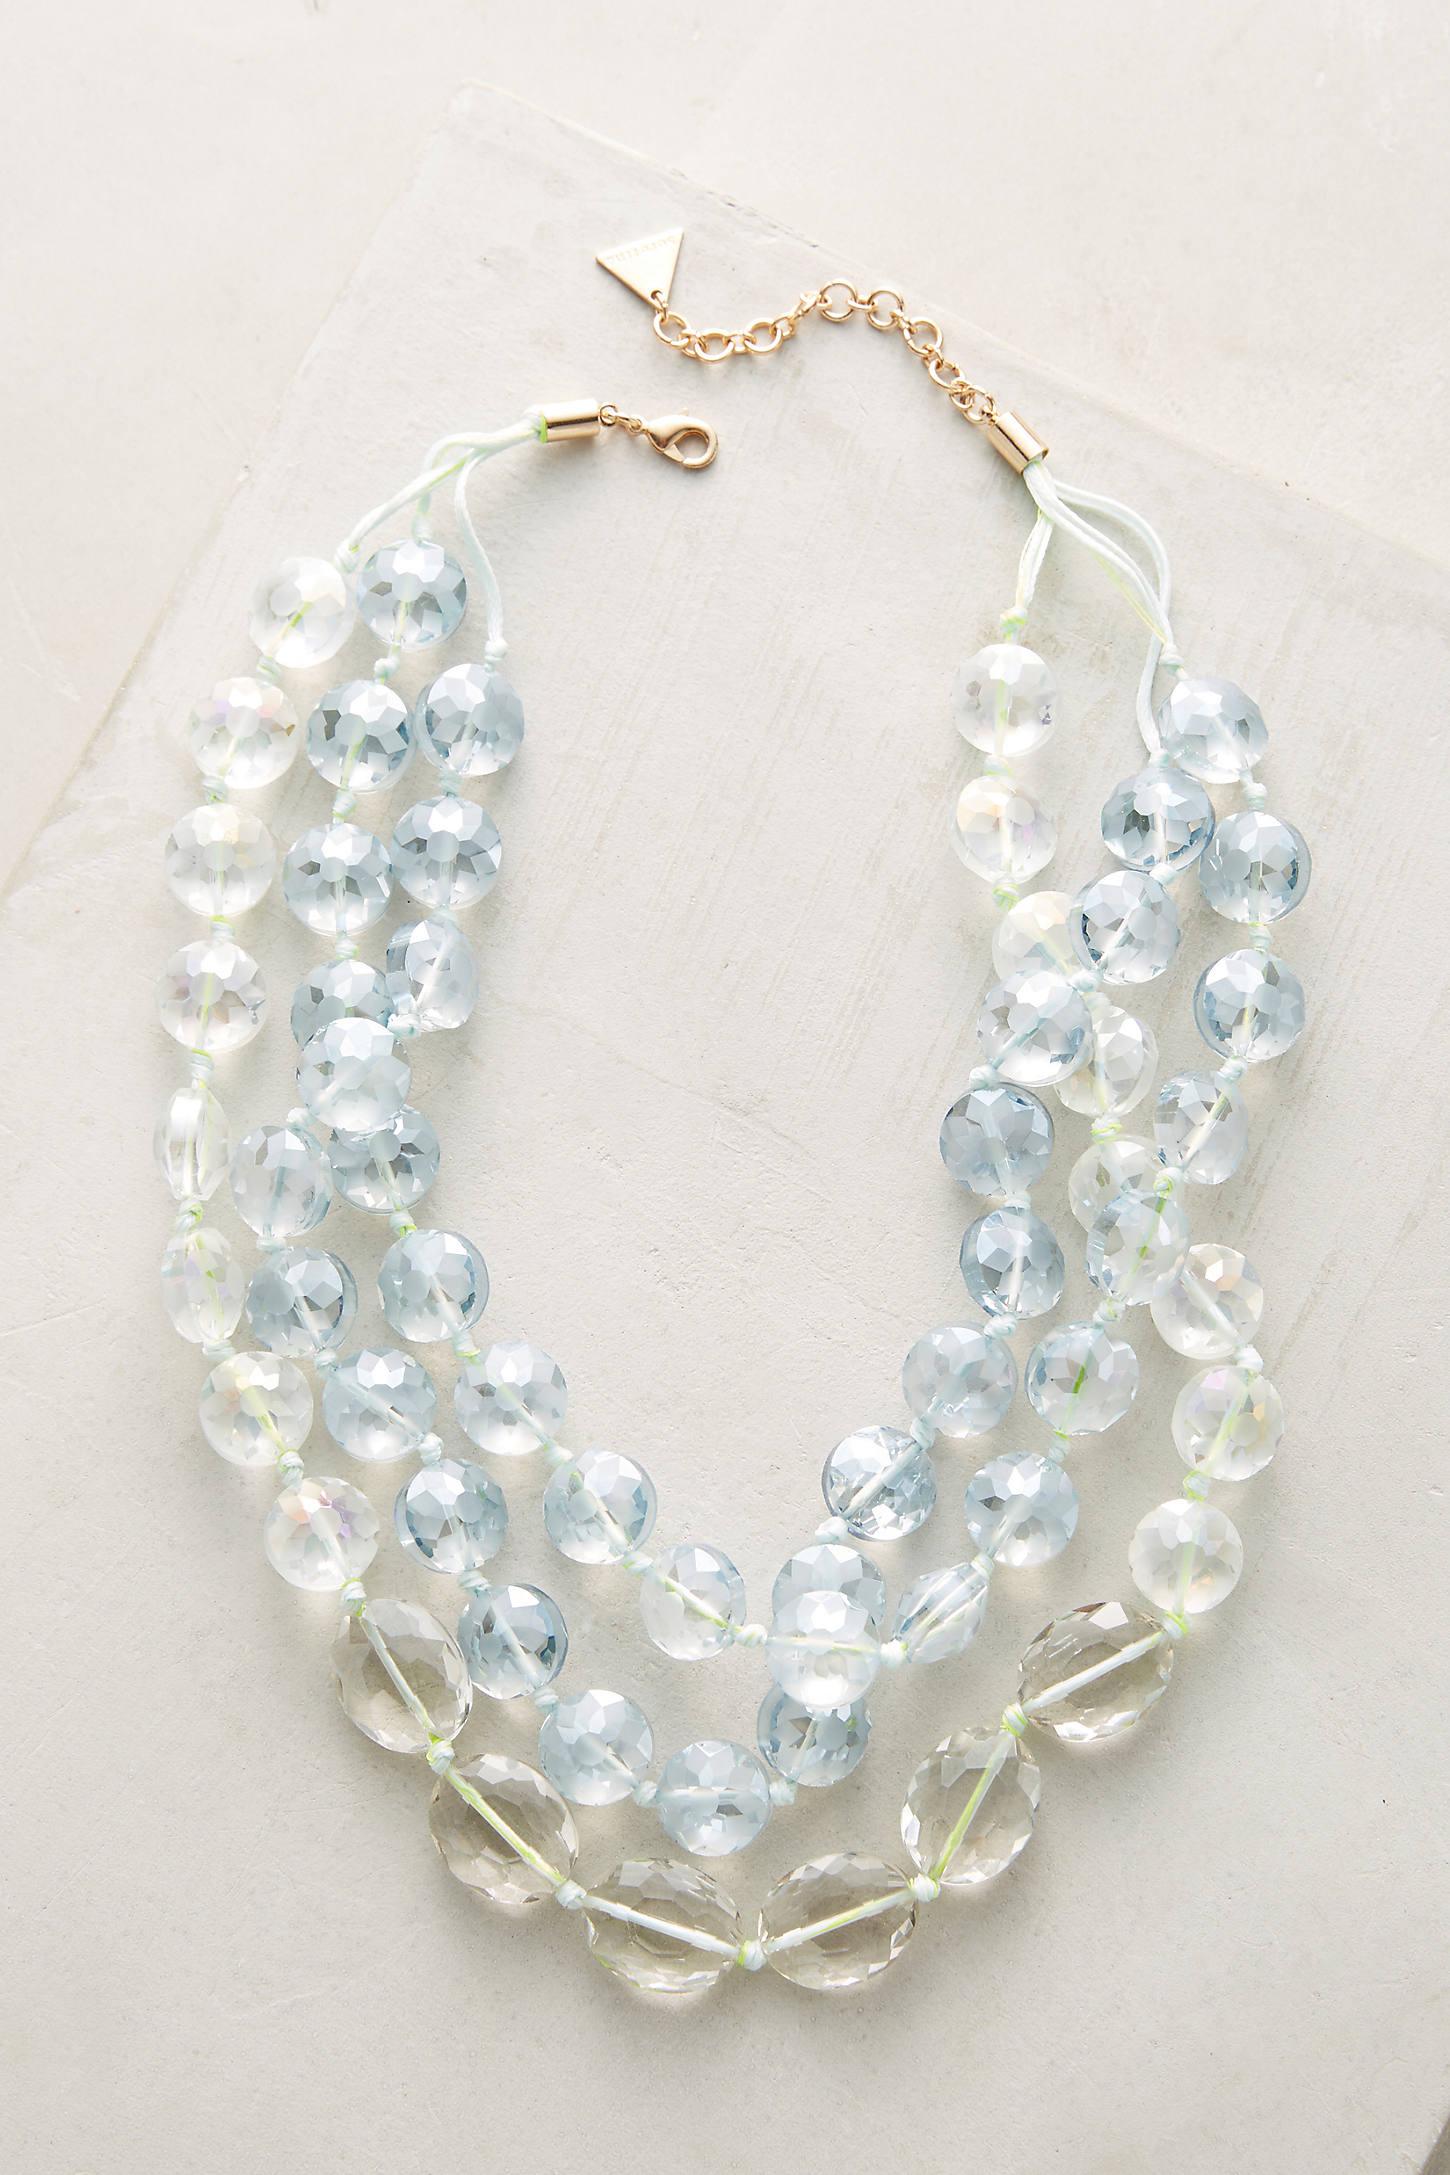 Orbital Layered Necklace